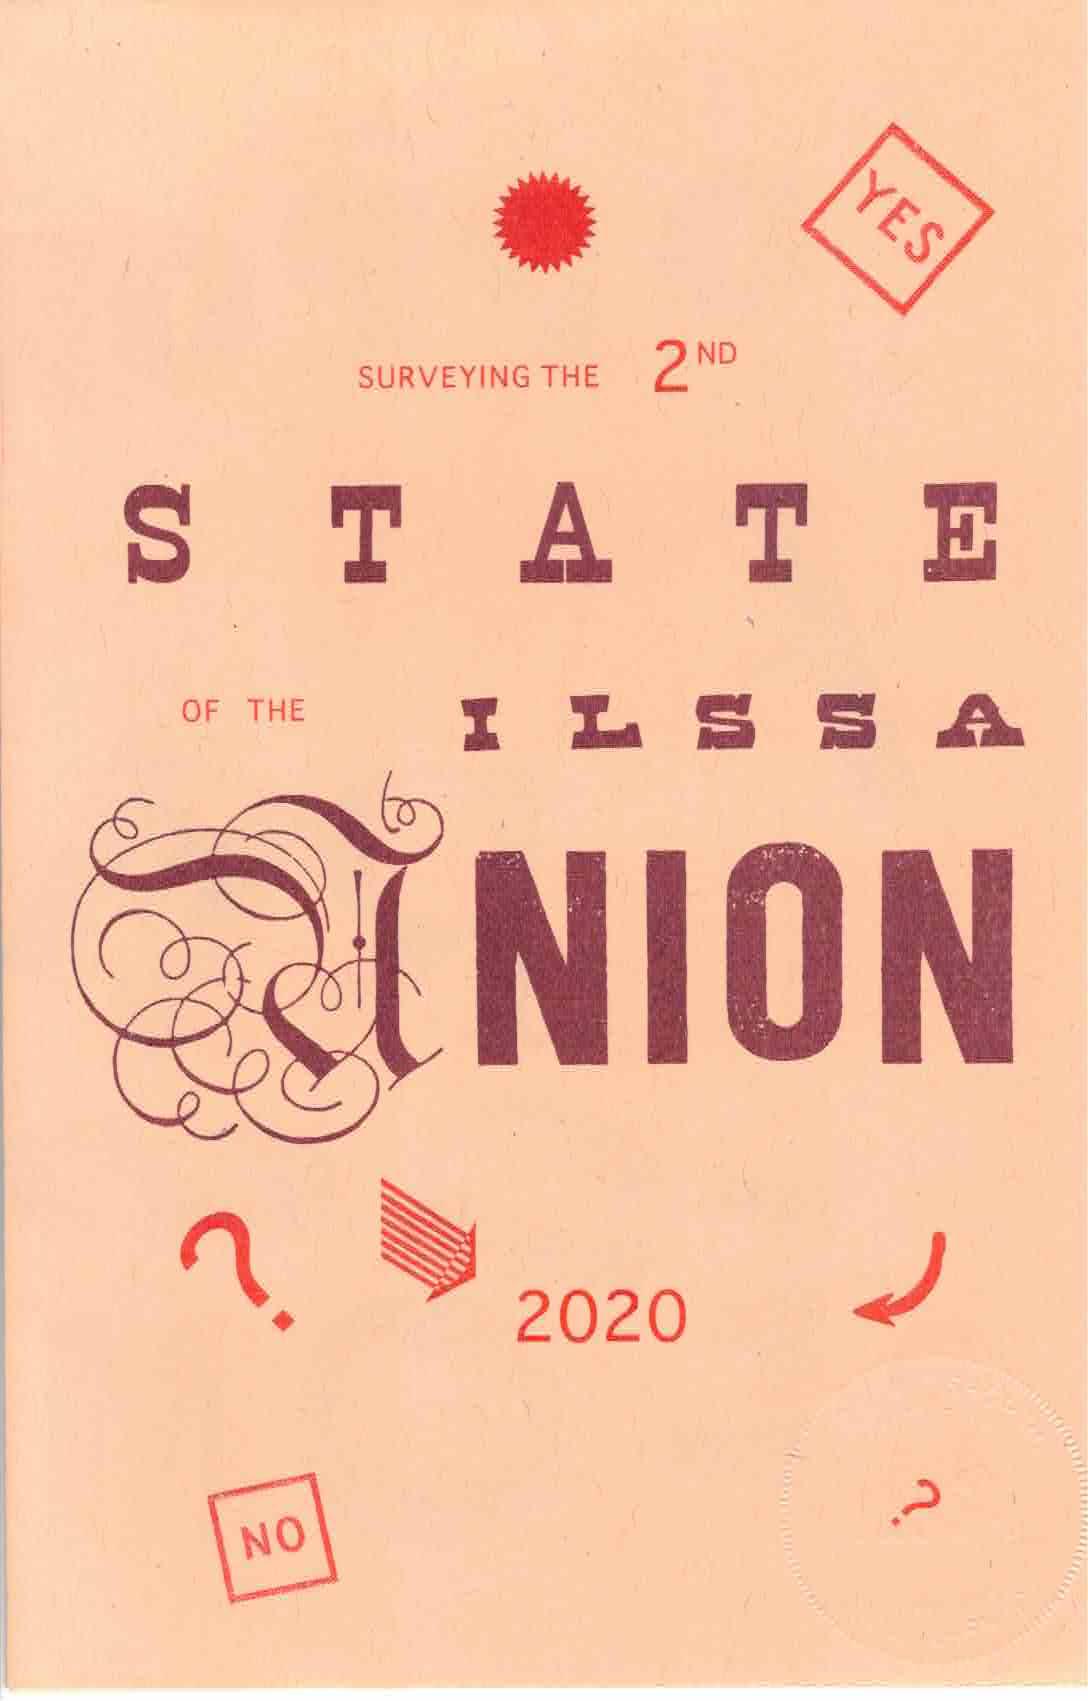 ILSSA News Bulletin Cover